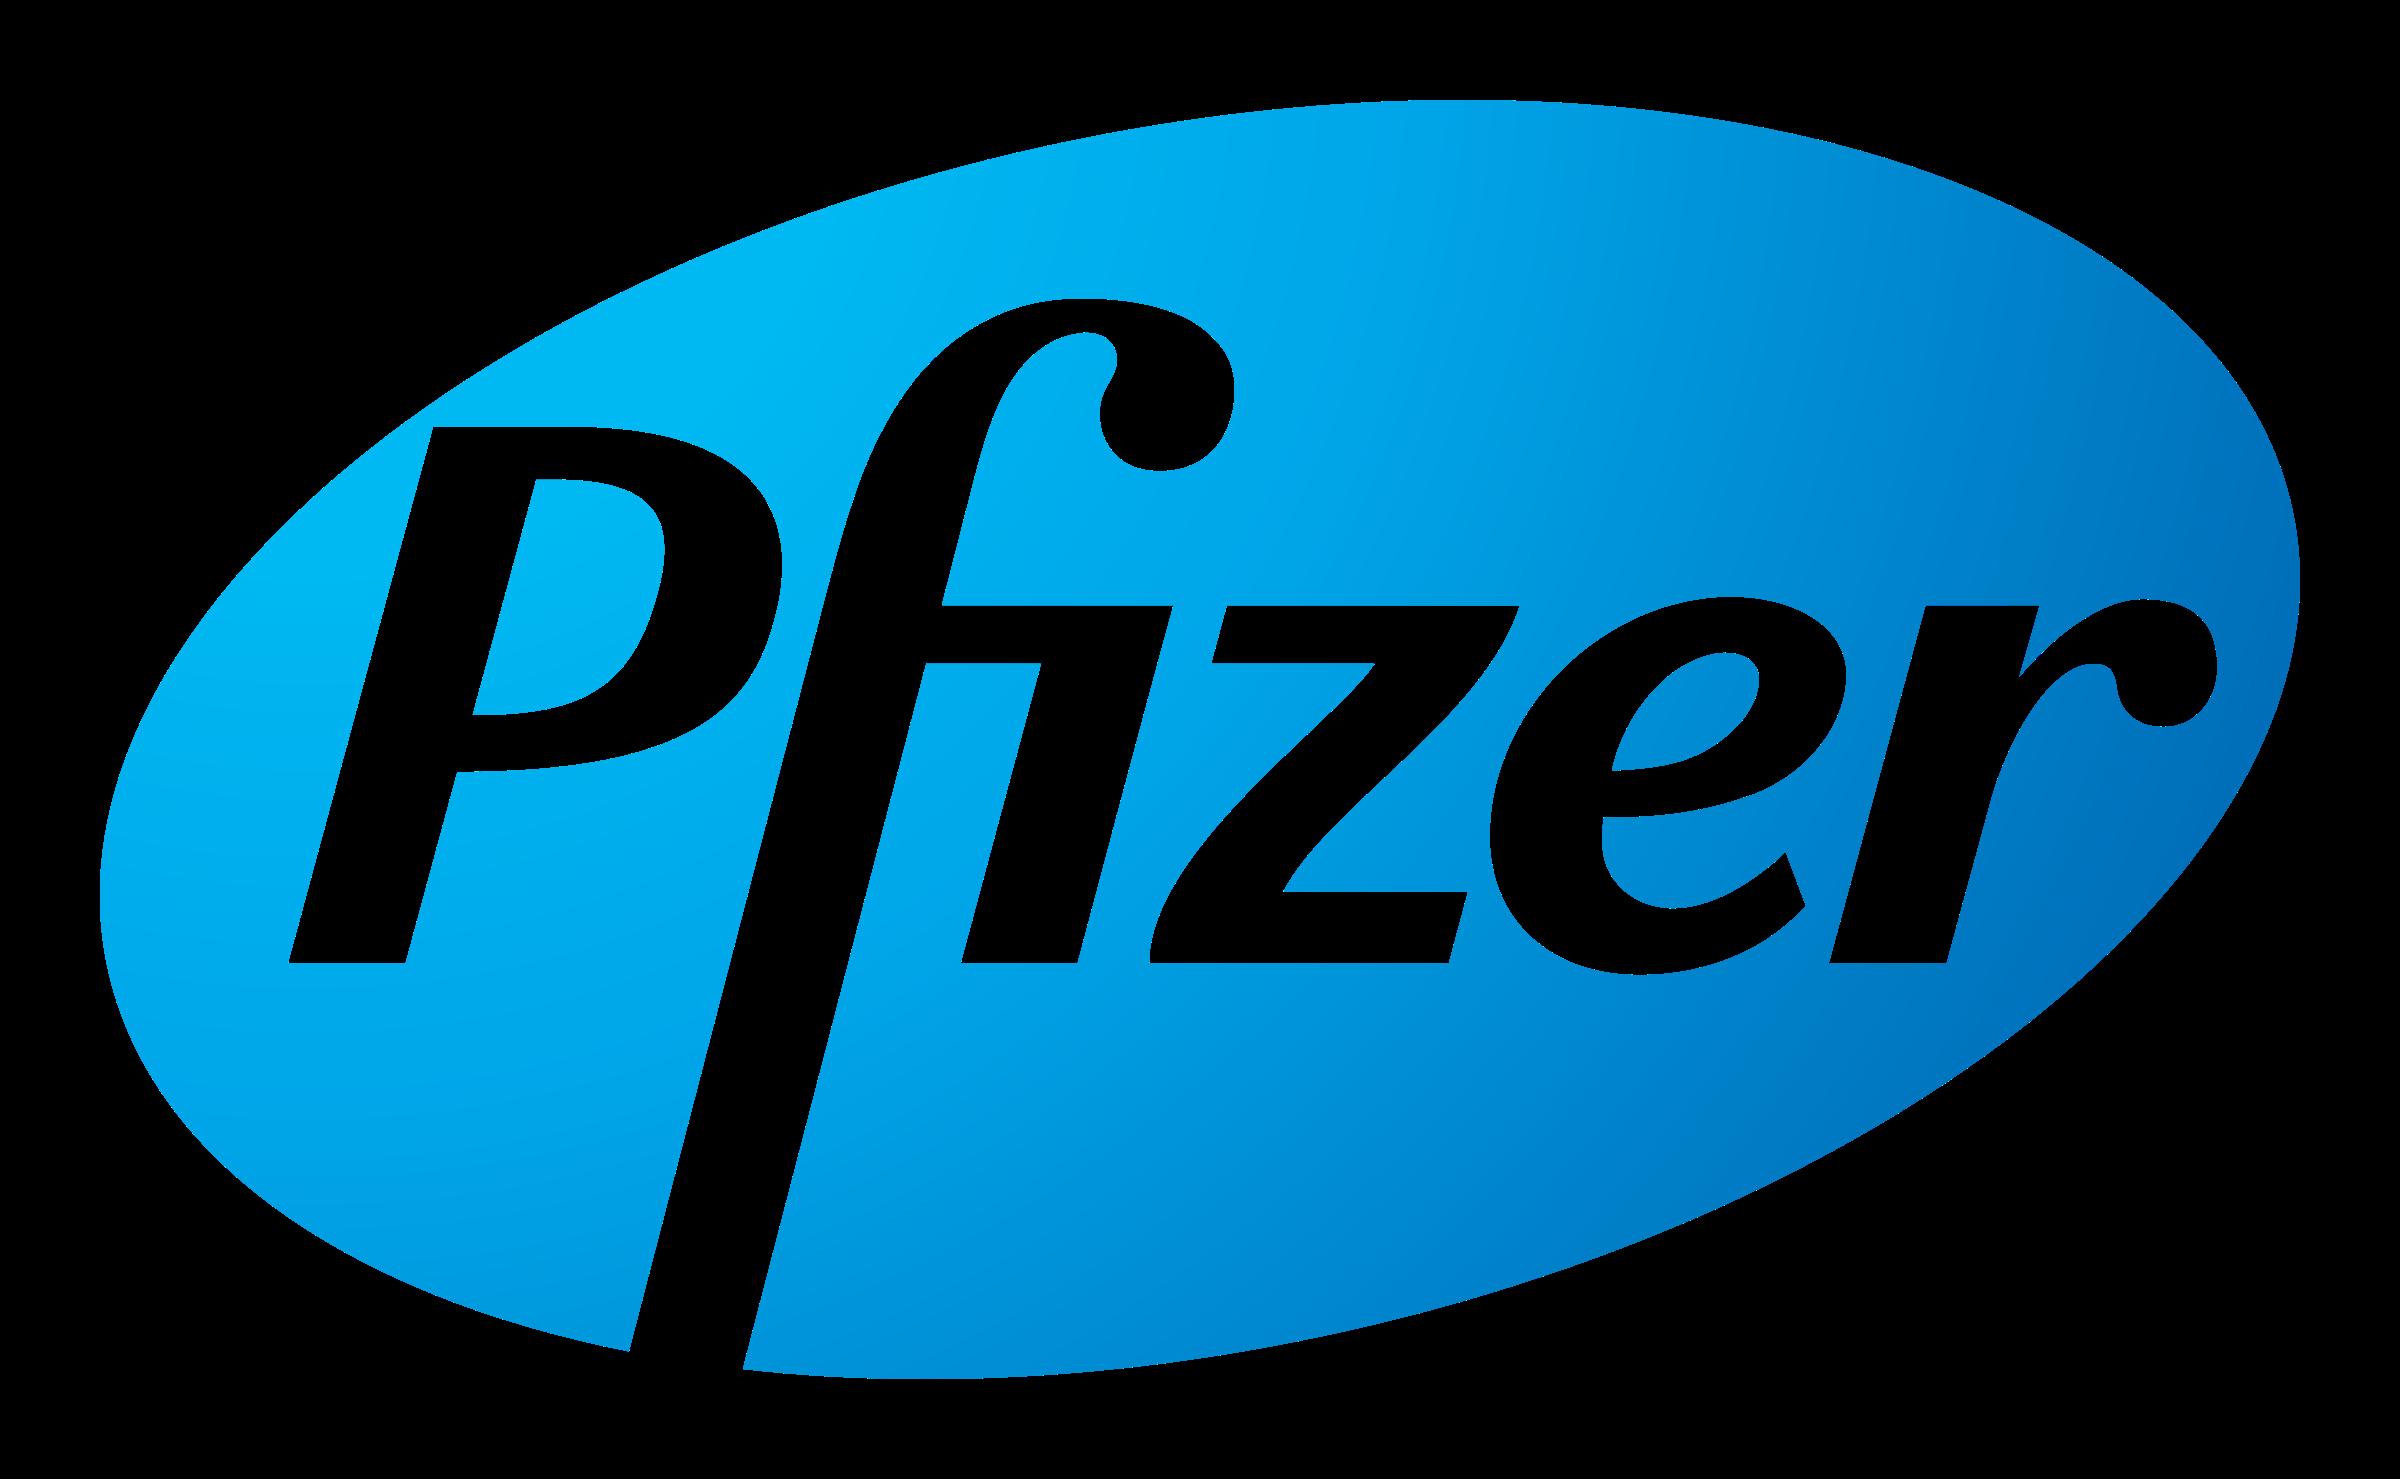 Pfizer Pfe Belgium